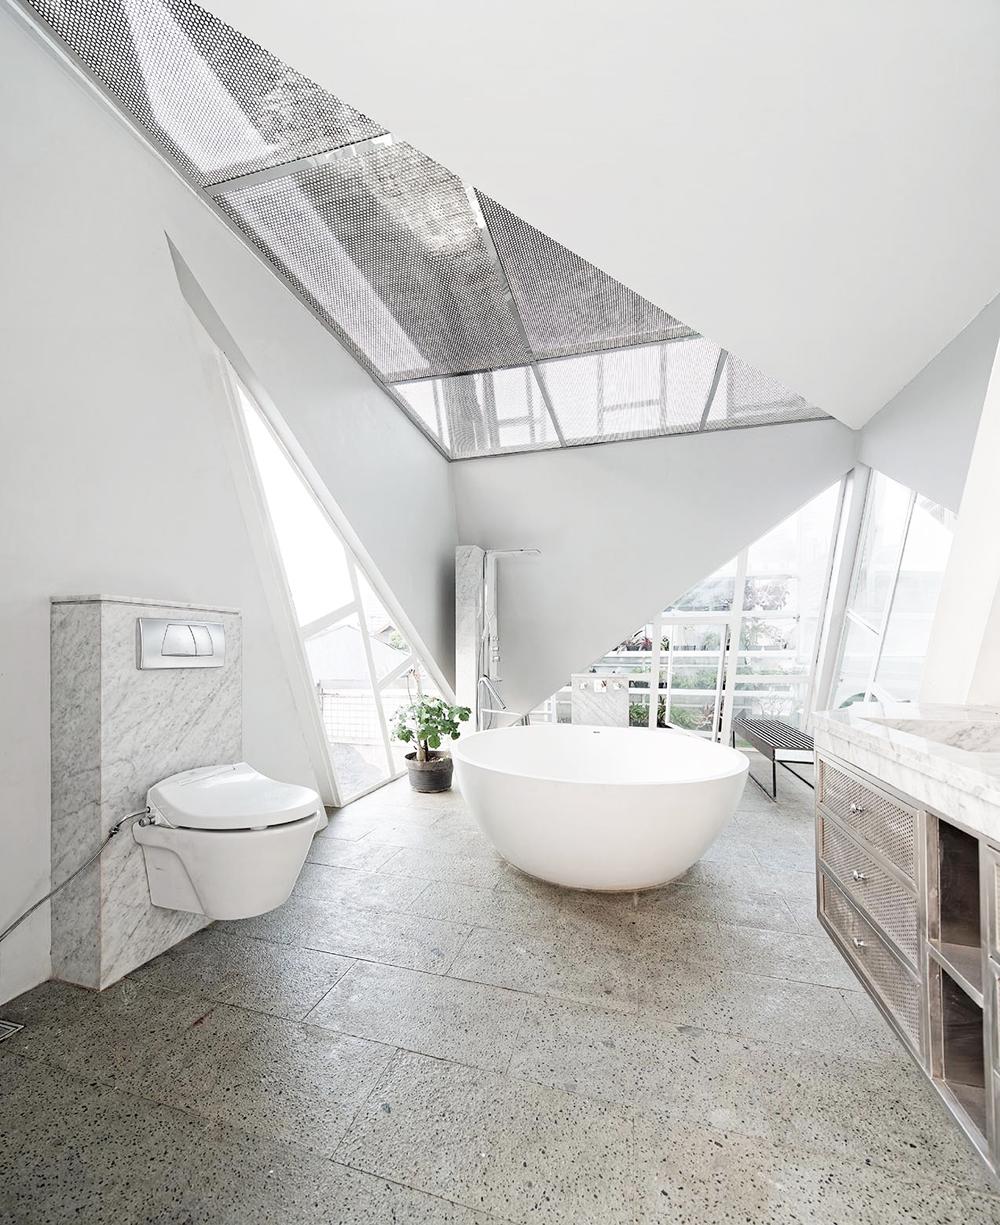 Oracle, Fox, Sunday, Sanctuary, Upside, White, Glass, Interior, Architecture, Industrial, Bathroom, Free Bath